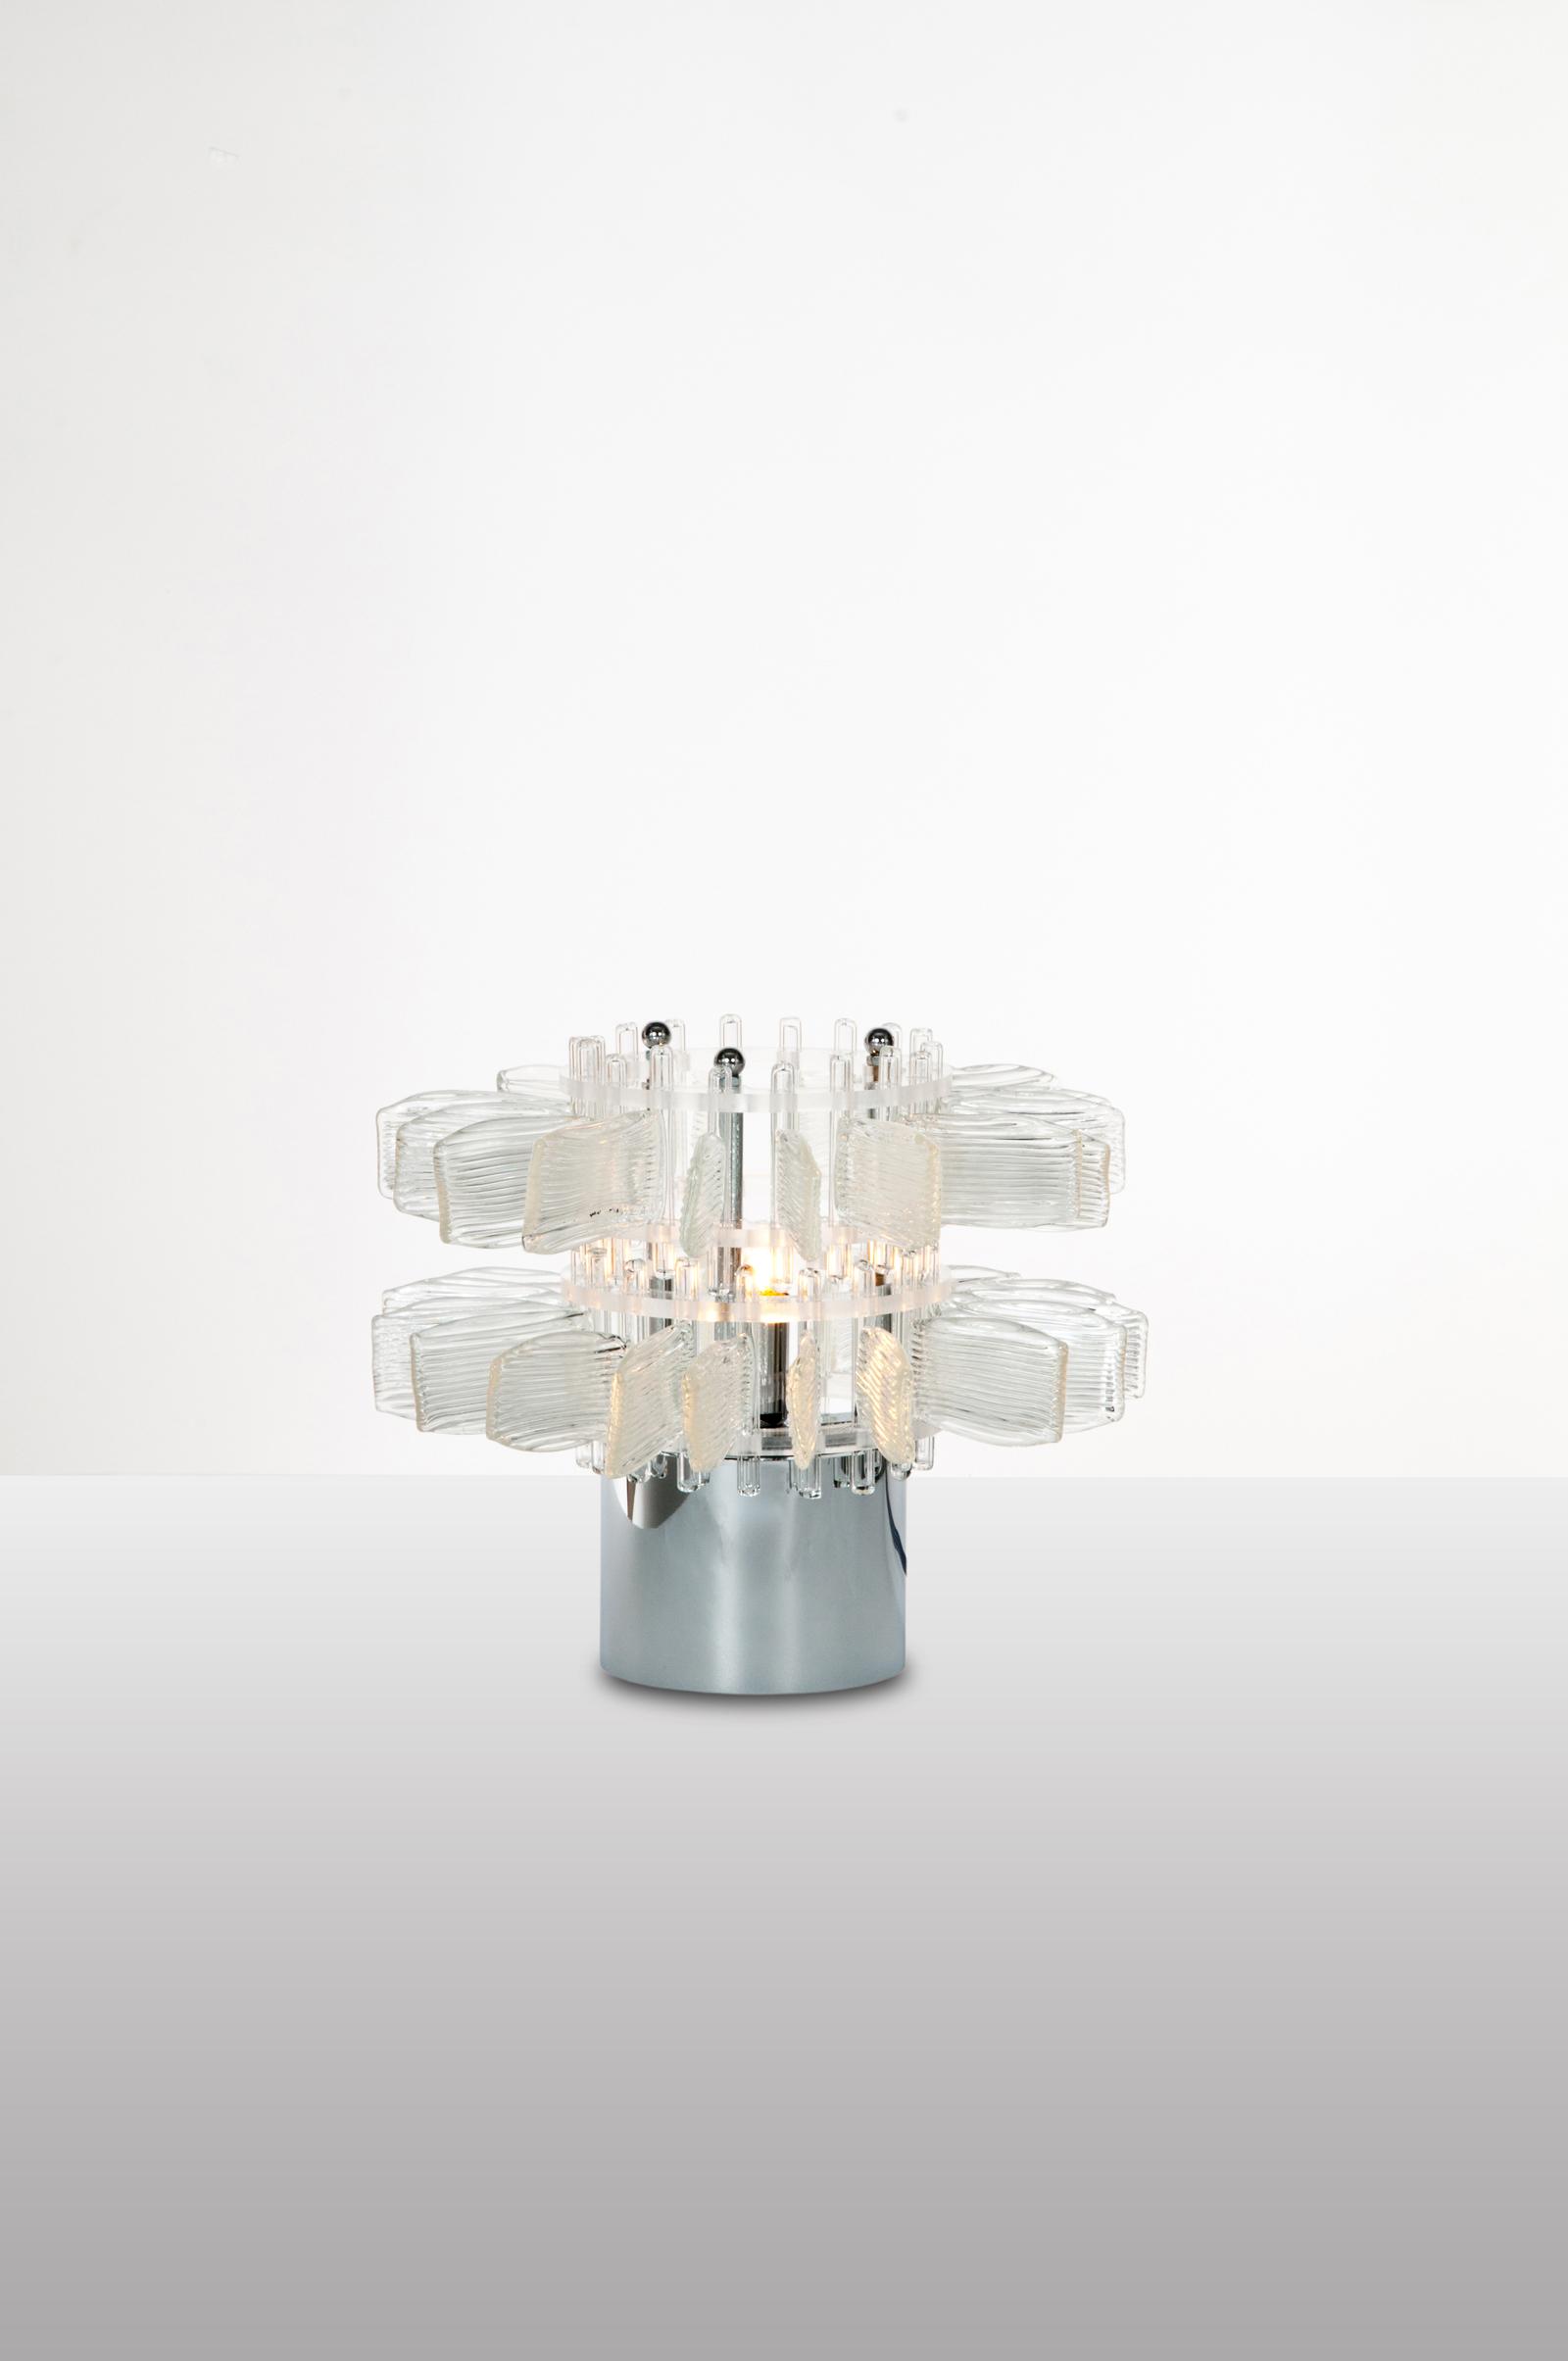 anemone-20-table-chrome-cristal-crystal-veronese-maurizio-galante-tal-lancman-21.jpg